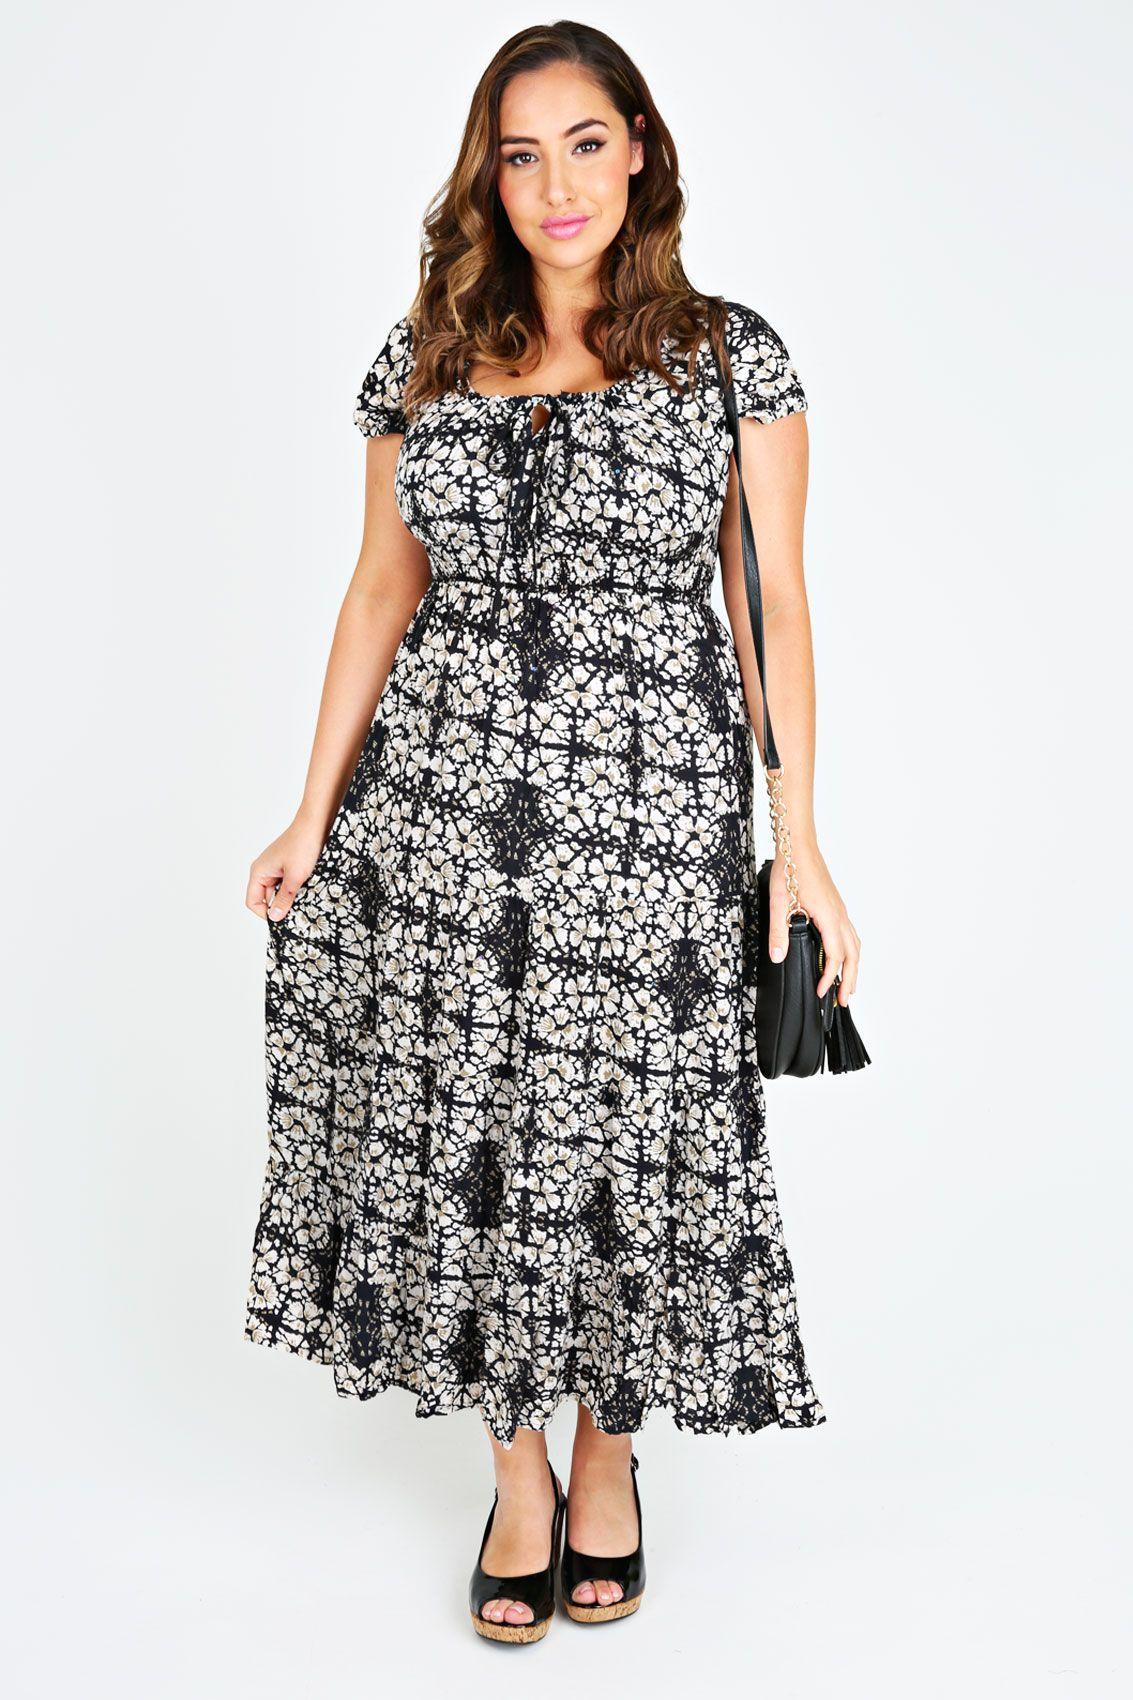 Black & Cream Batik Print Gypsy Maxi Dress | My clothes wishlist ...